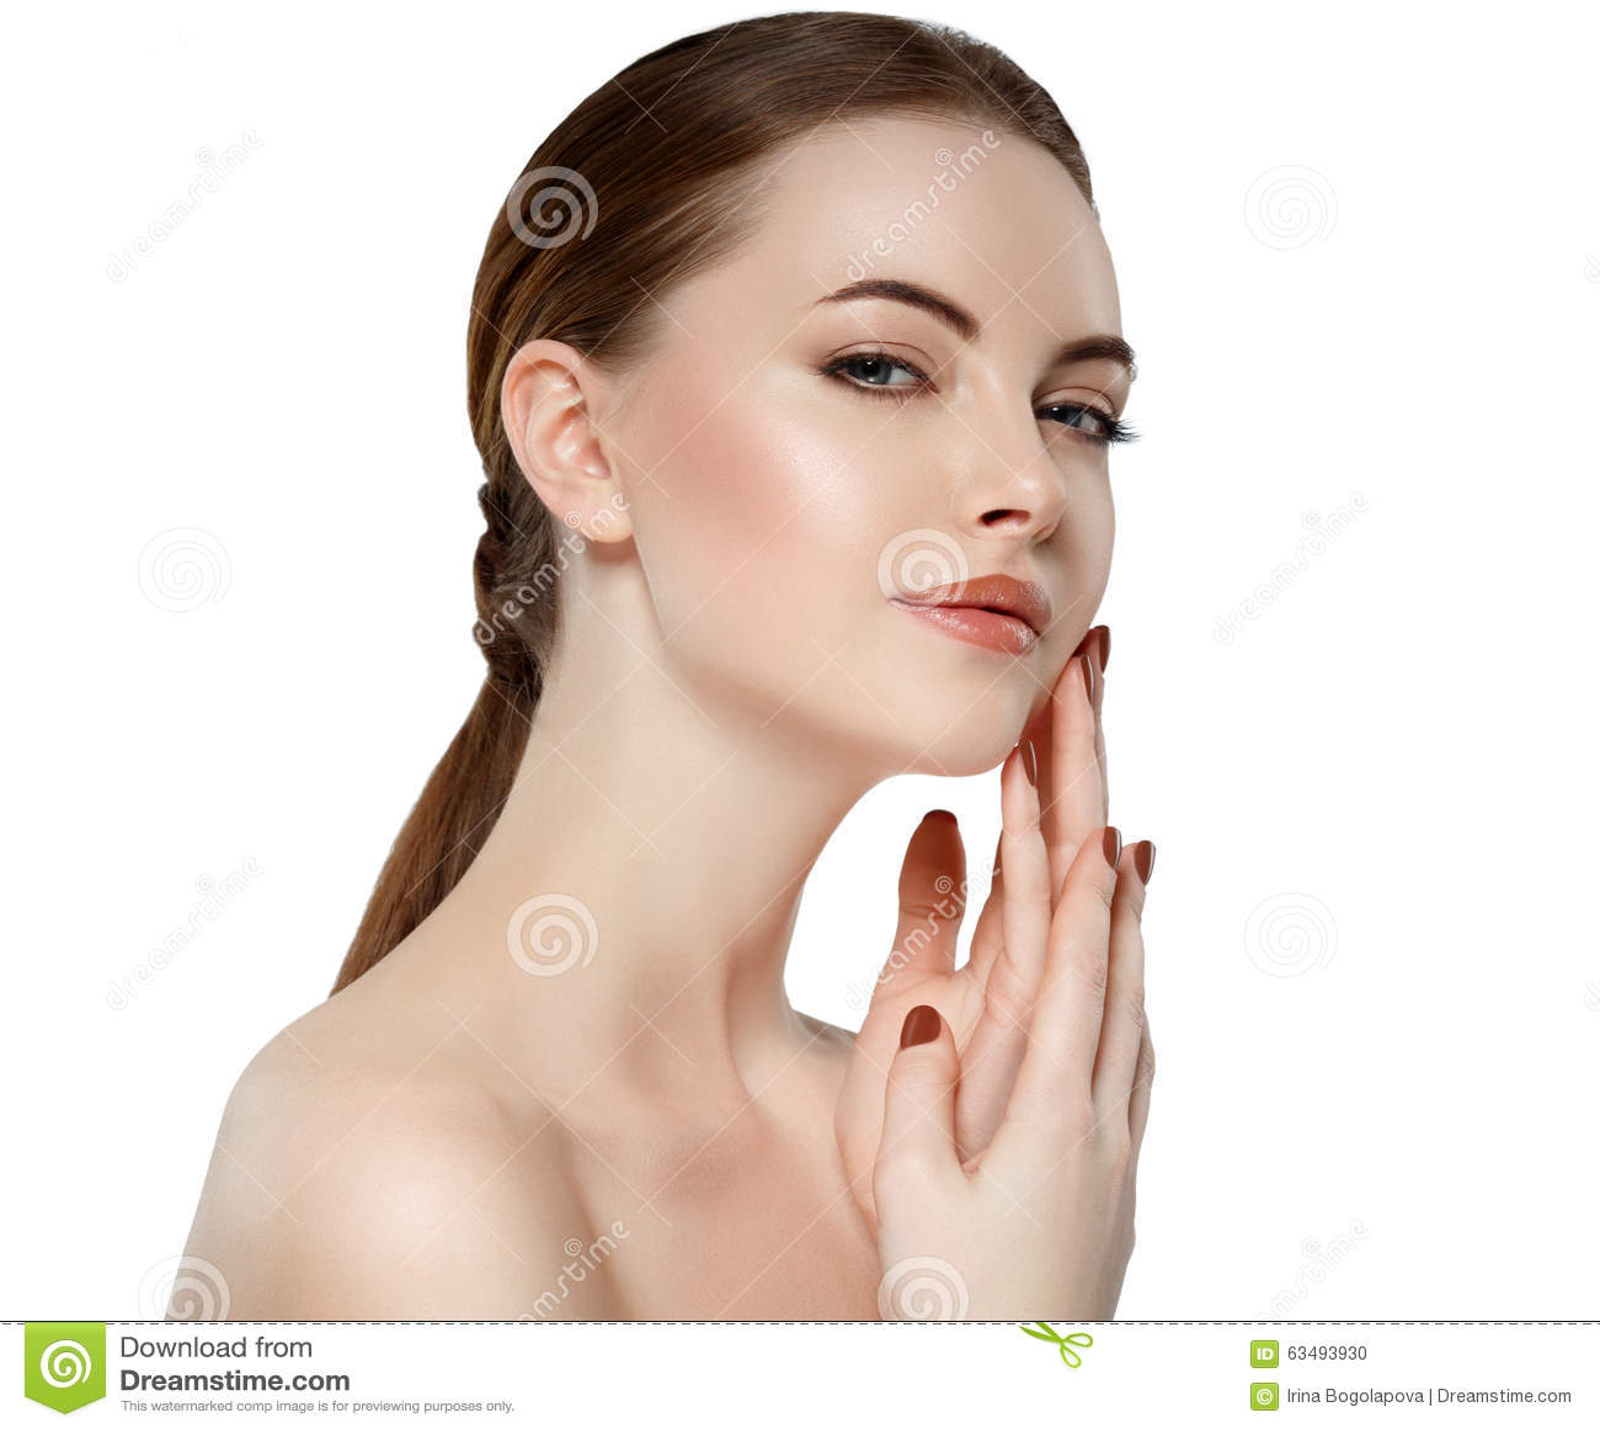 Woman pleasure face